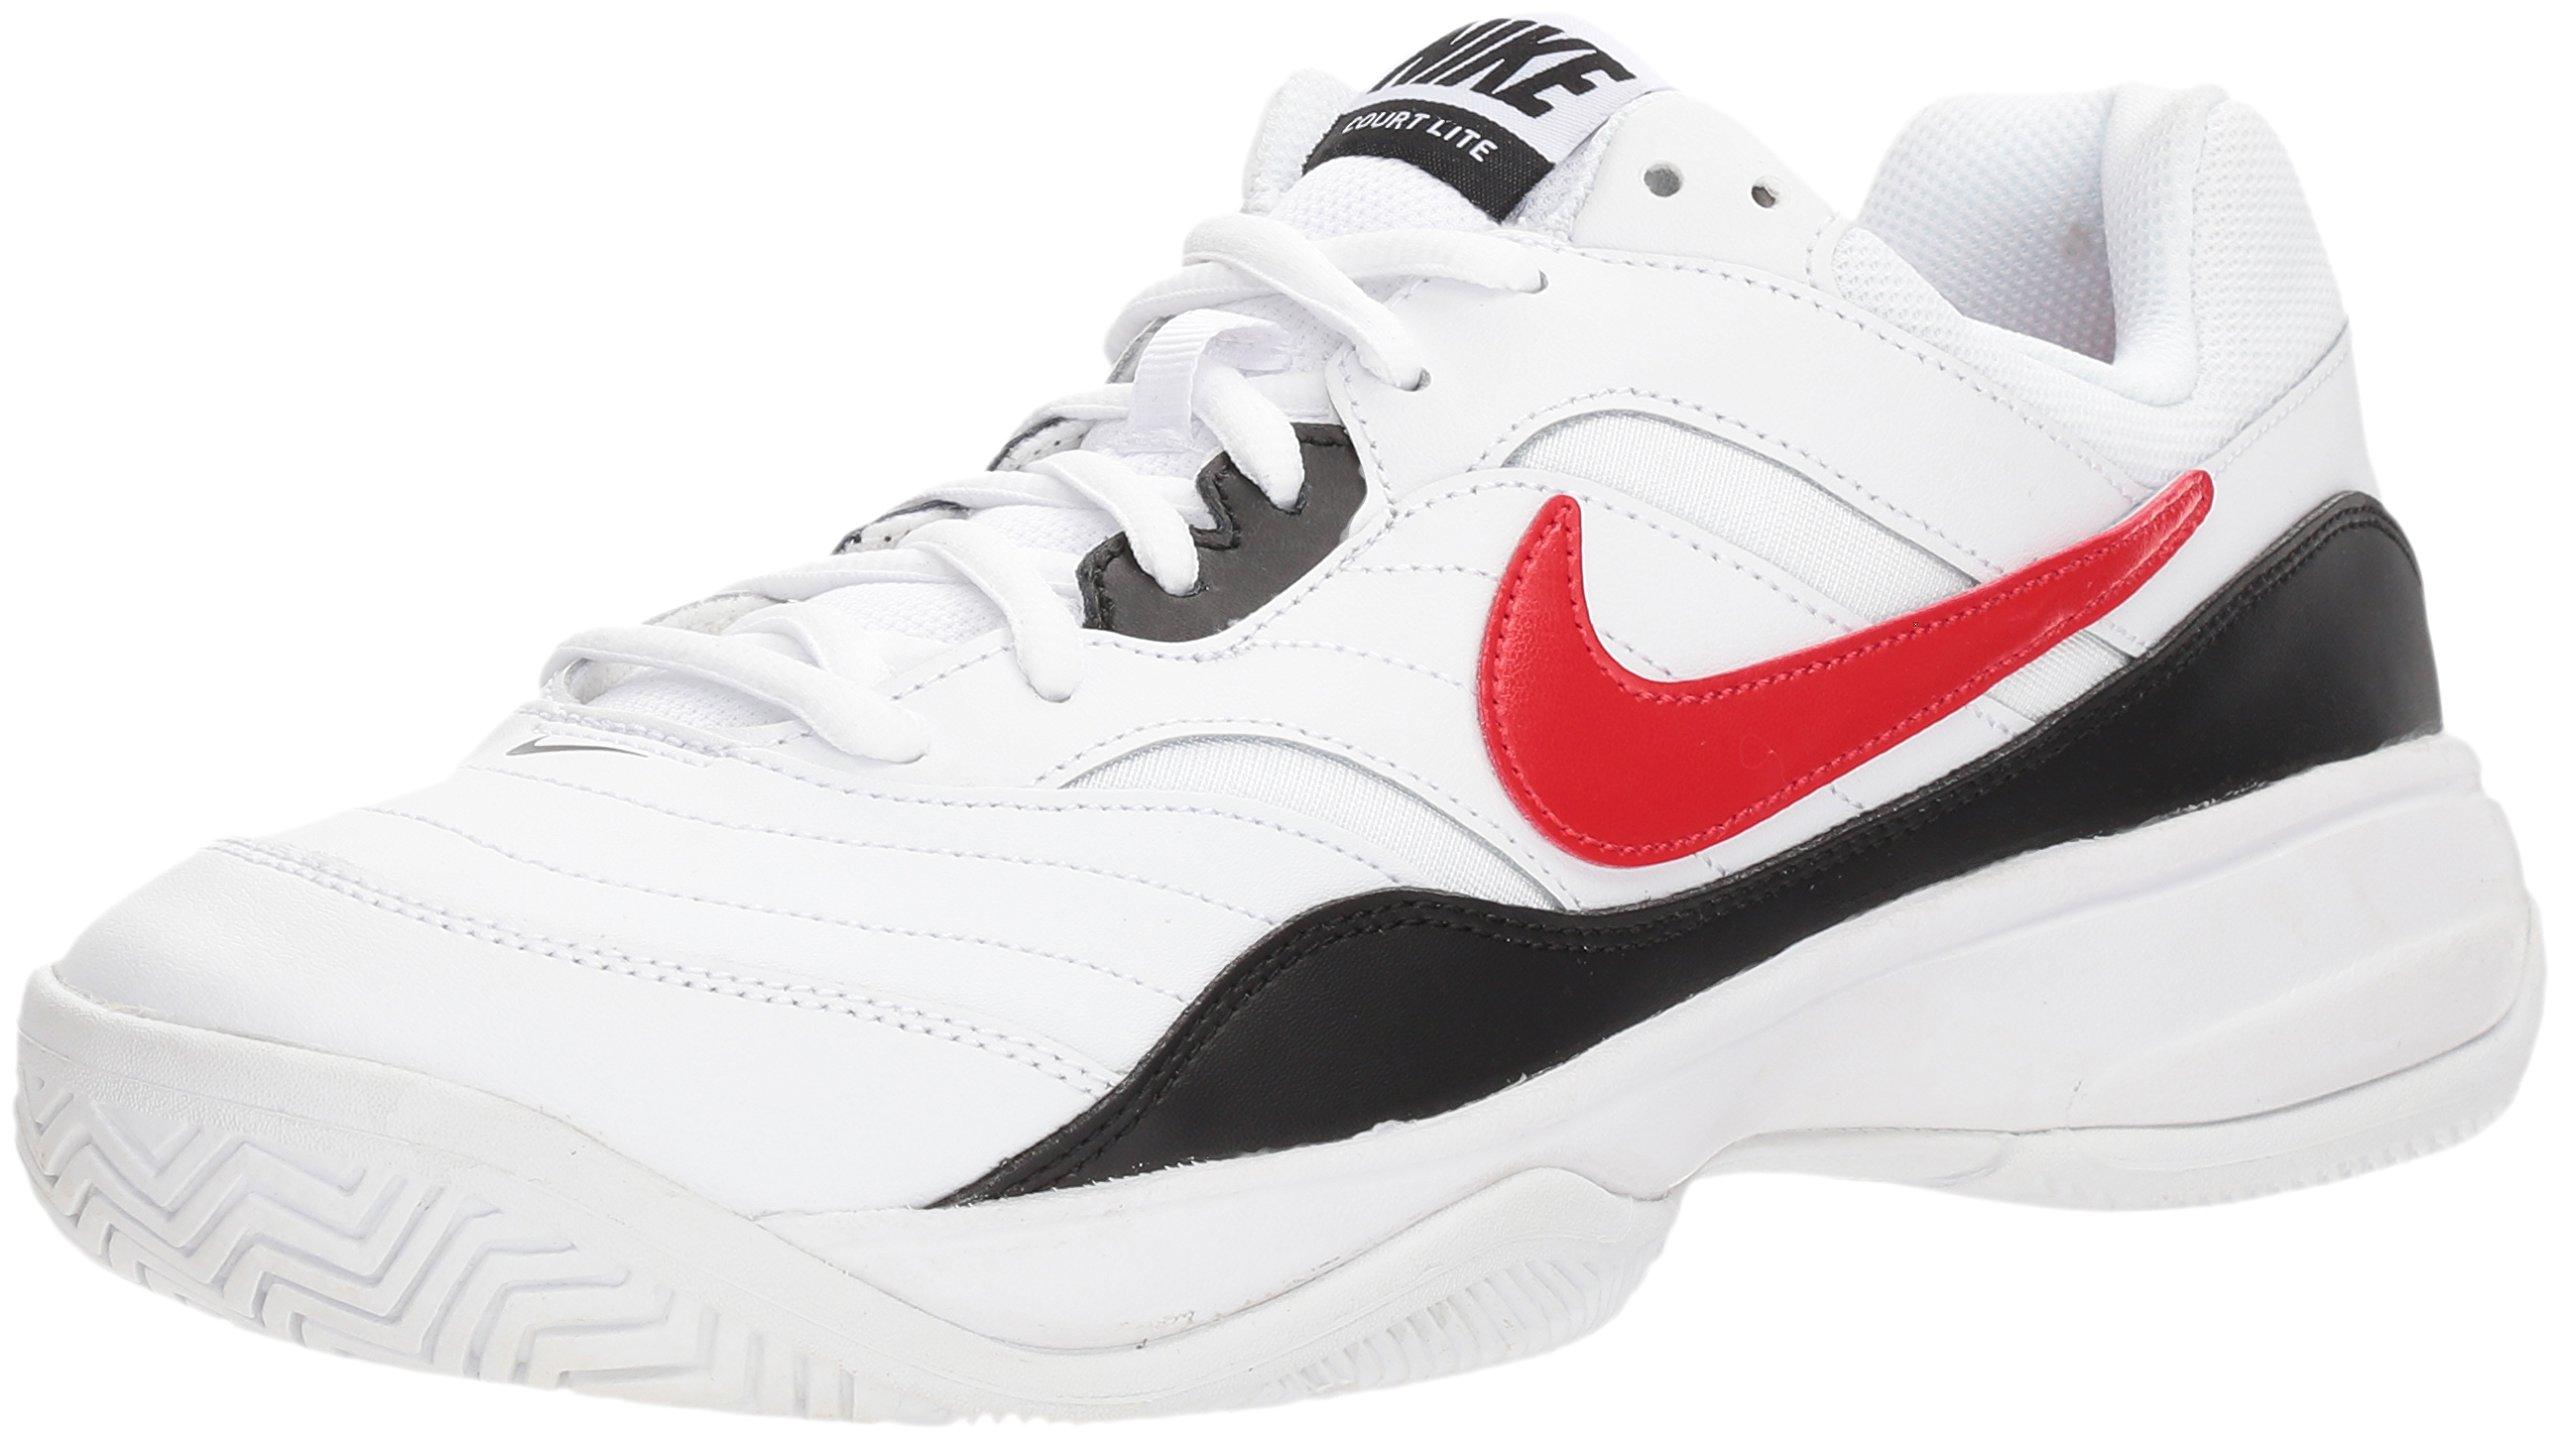 Nike Men's Court Lite Tennis Shoe, White/University red/Black, 7.5 D US